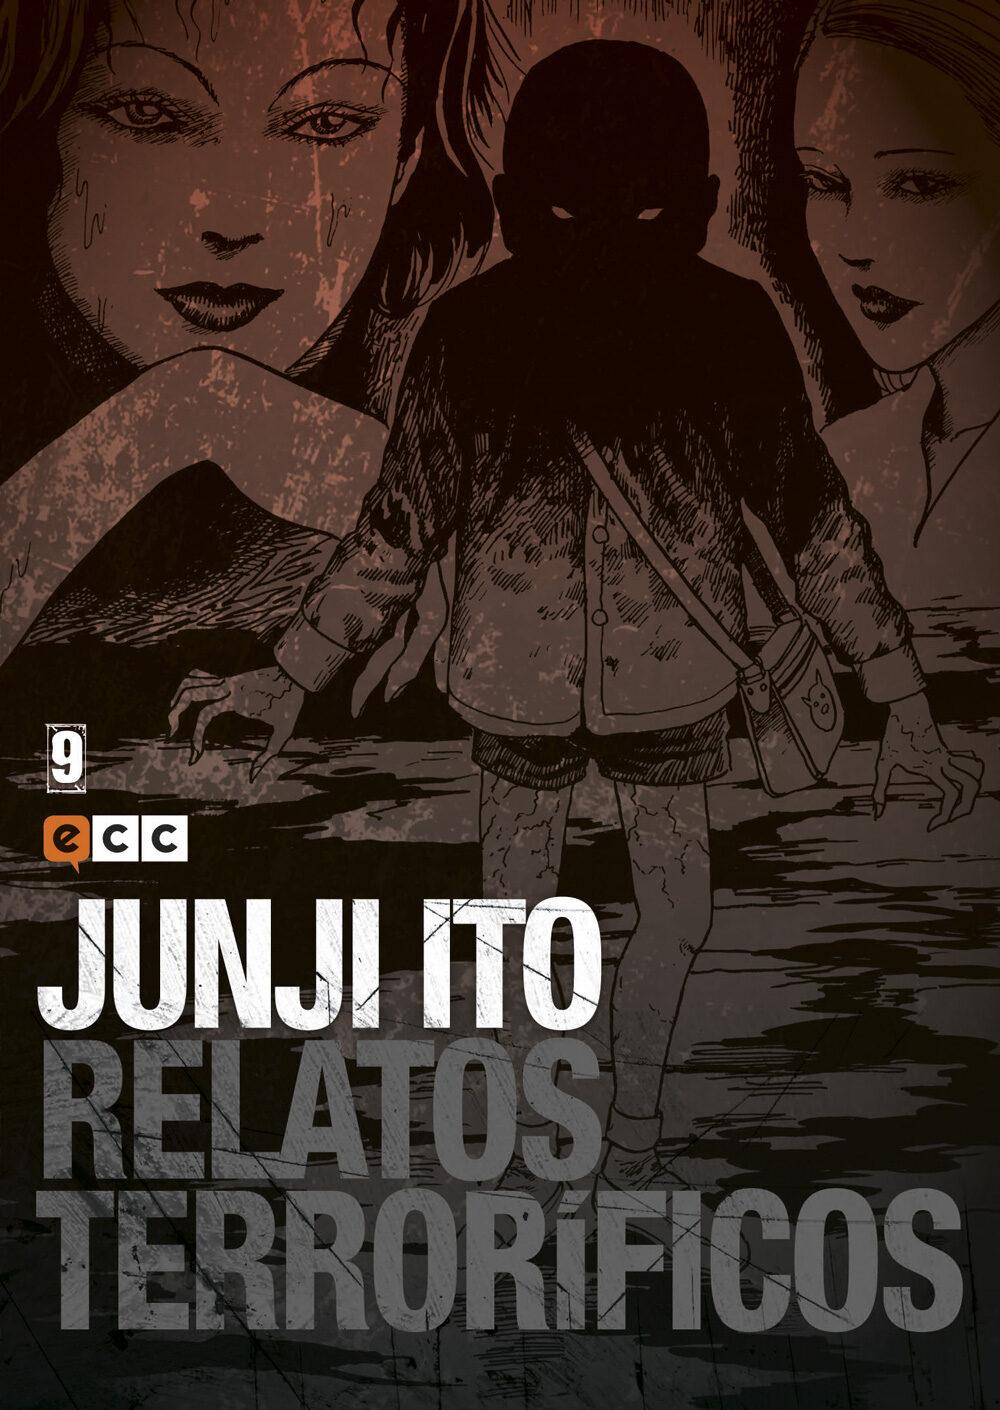 Junji Ito: Relatos Terrorificos Nº 09 - Ito Junji